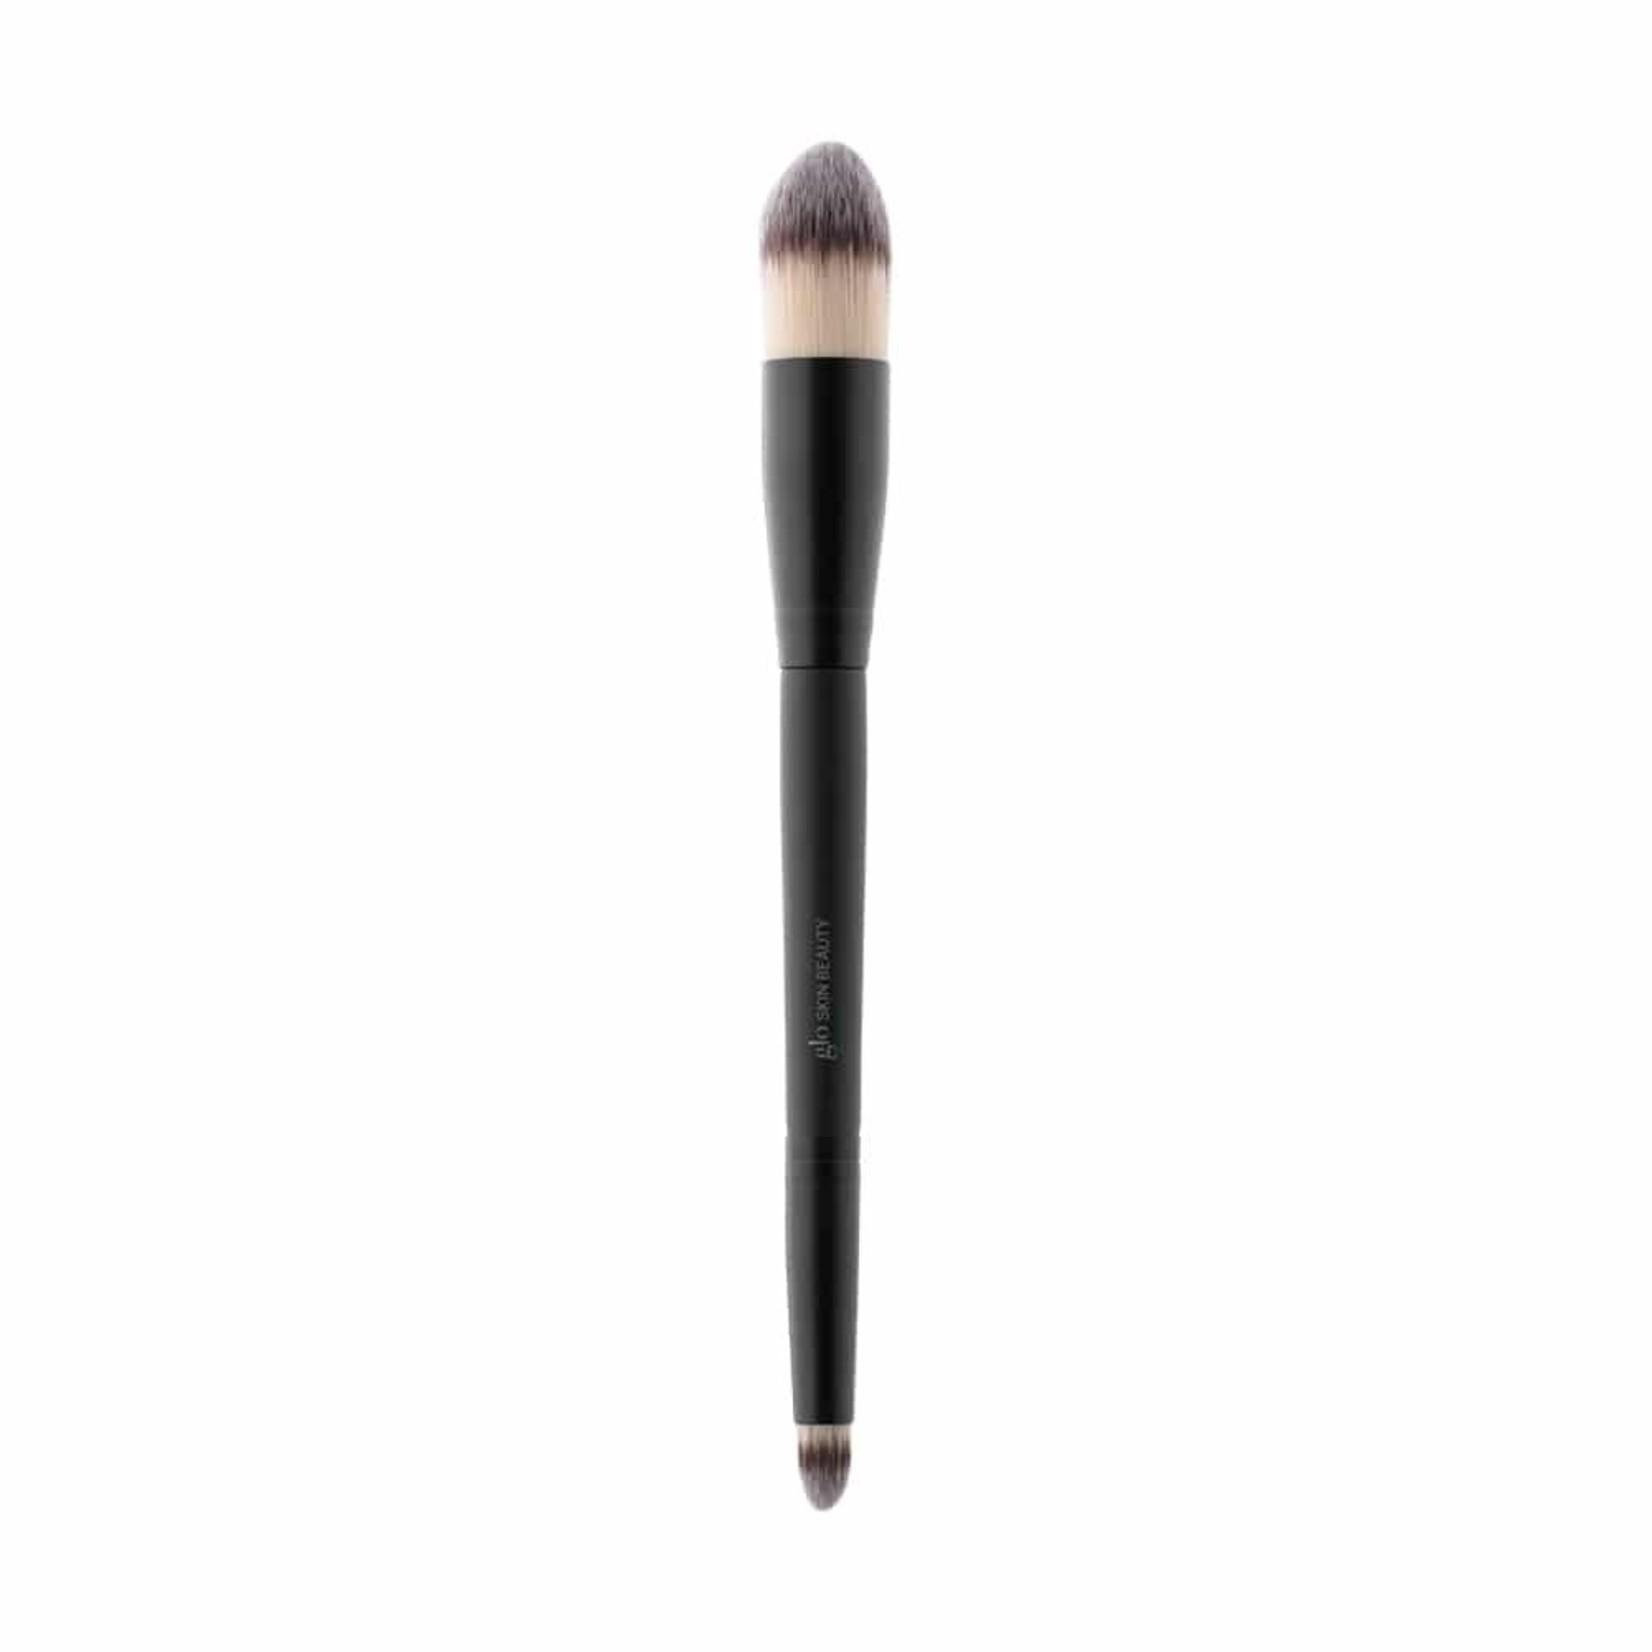 Glo Skin Beauty 109 Dual Foundation/Camouflage Brush